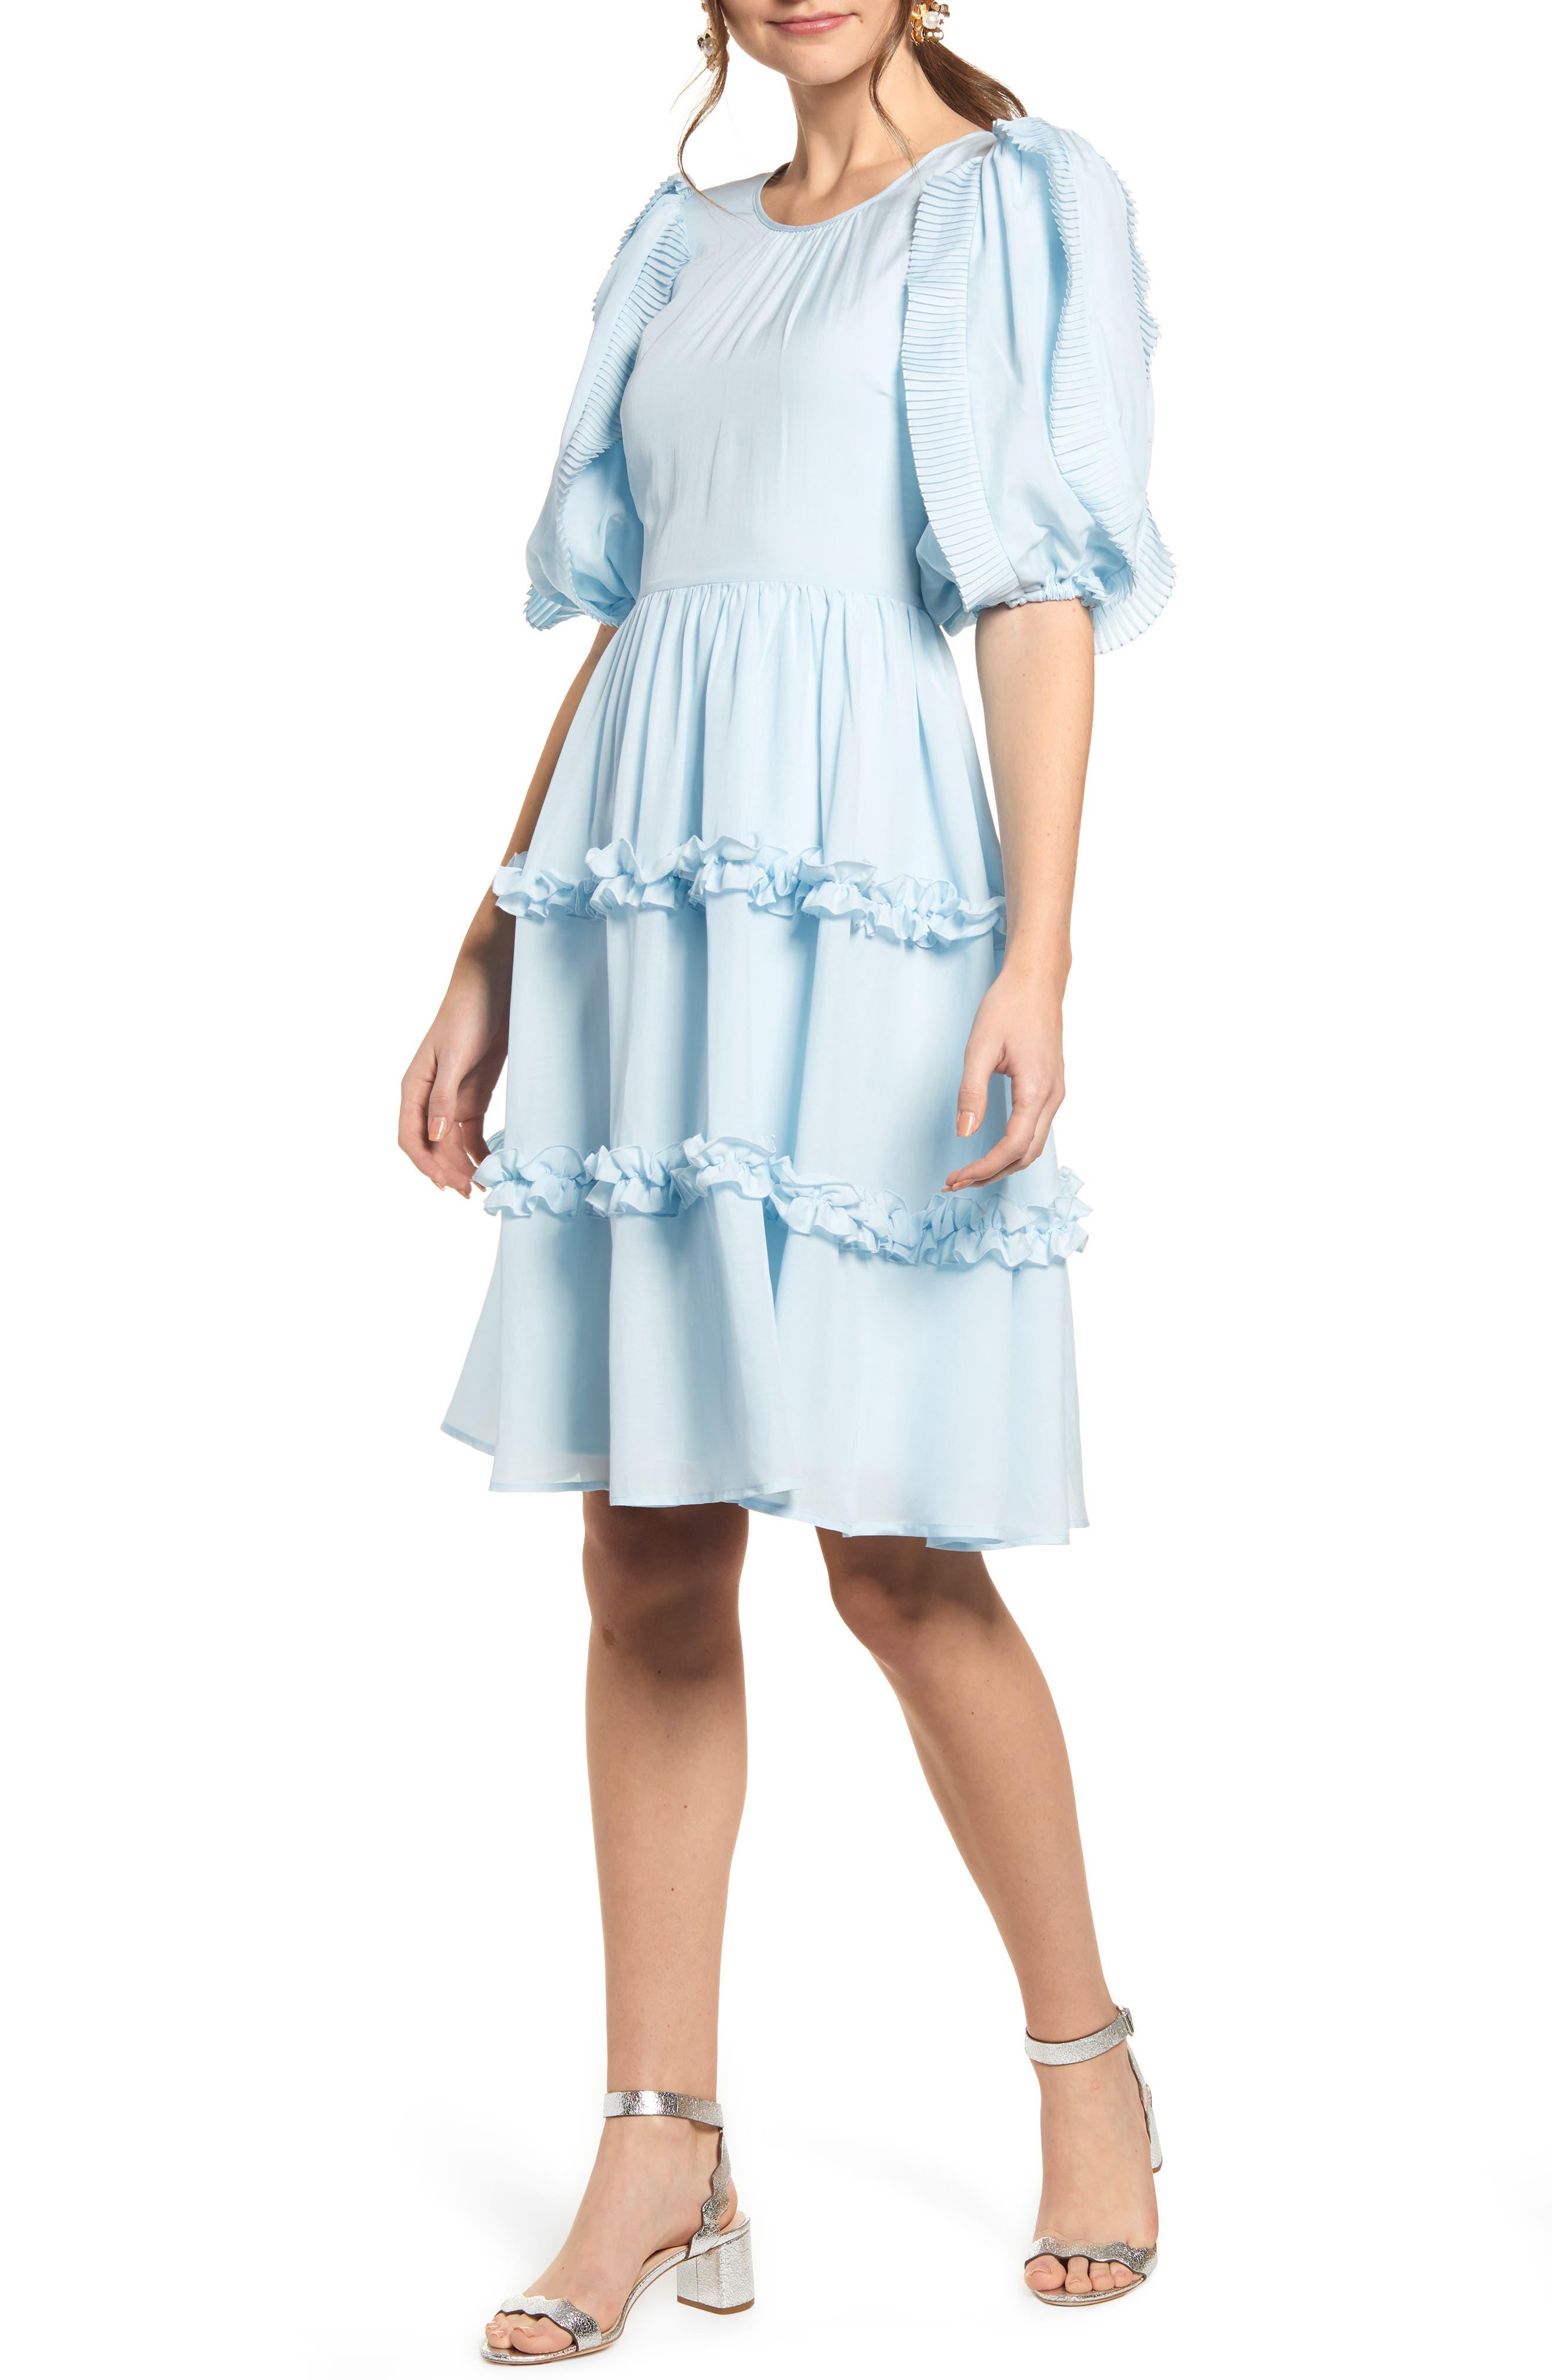 RACHEL PARCELL, Ruffle Sleeve Dress, Main thumbnail 1, color, BLUE WINTER